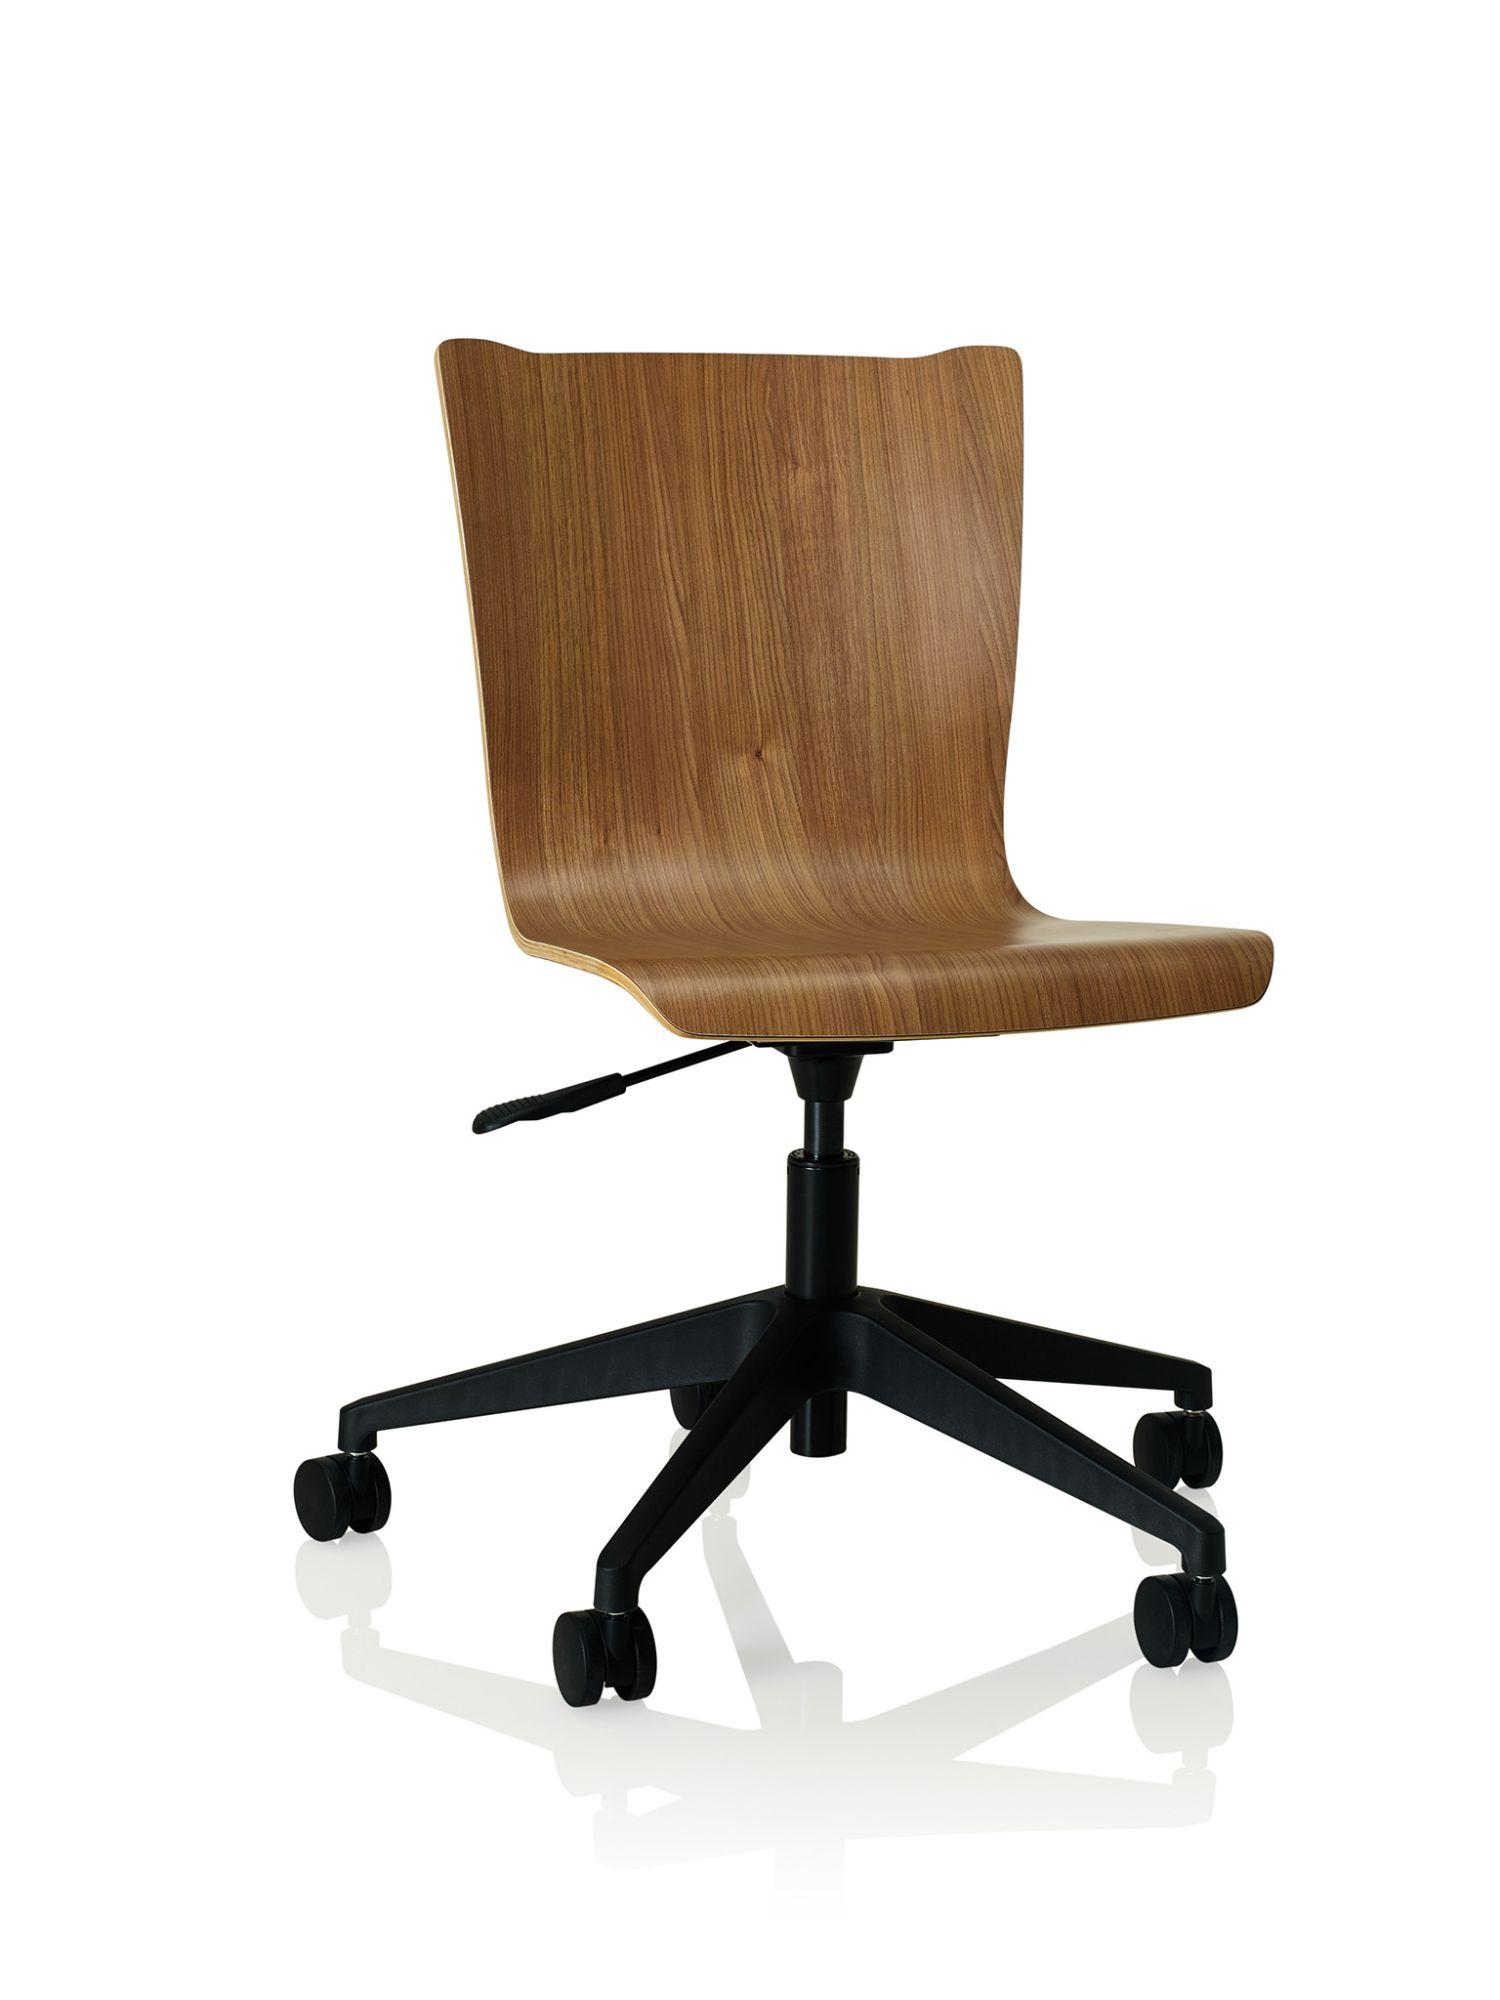 river cherry apply laminate task chair